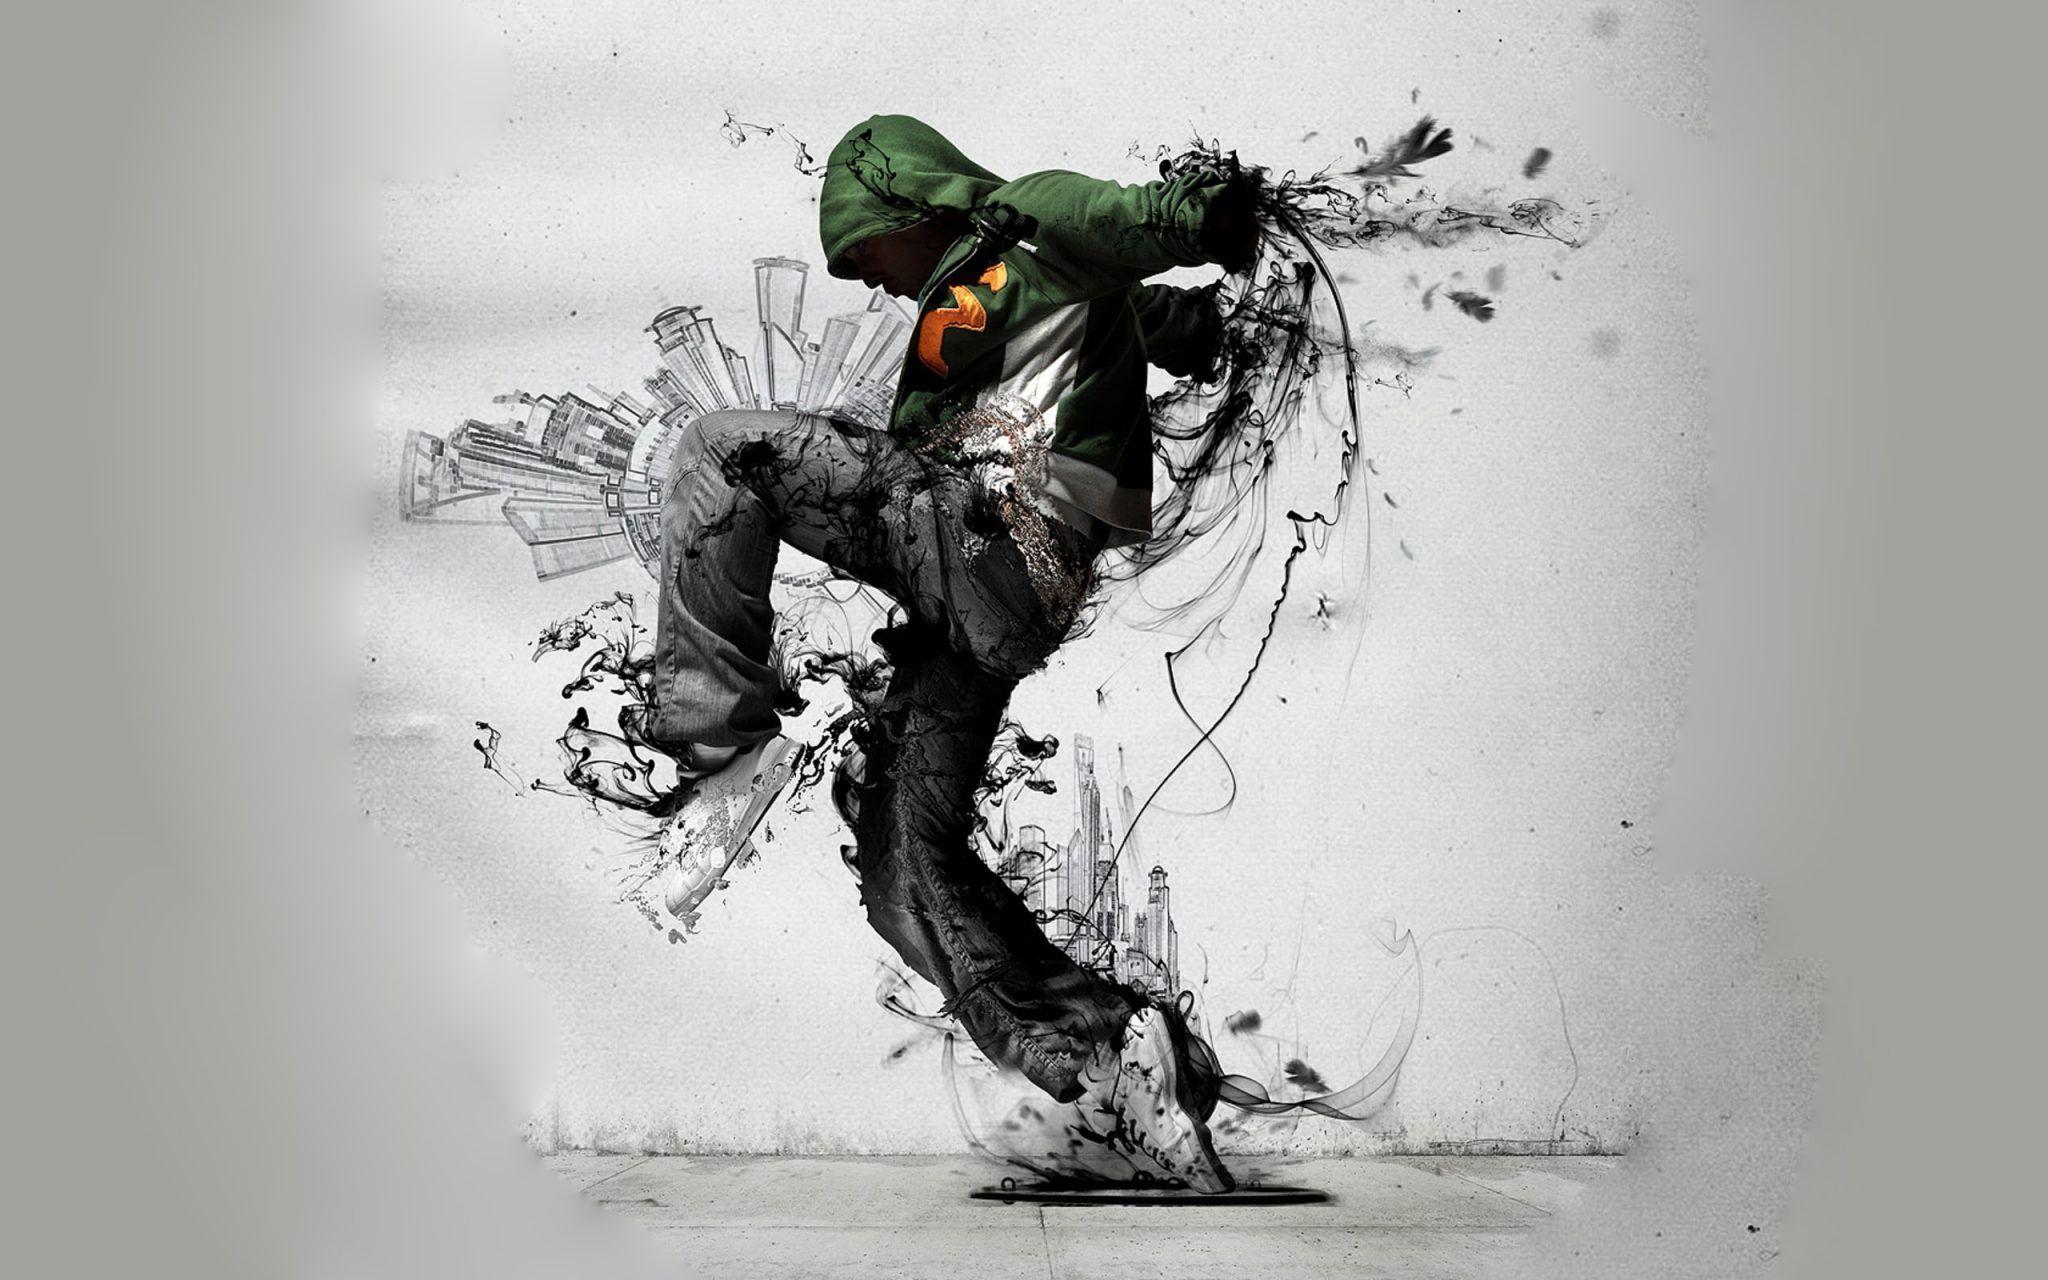 Dance wallpaper, Cool wallpapers ...